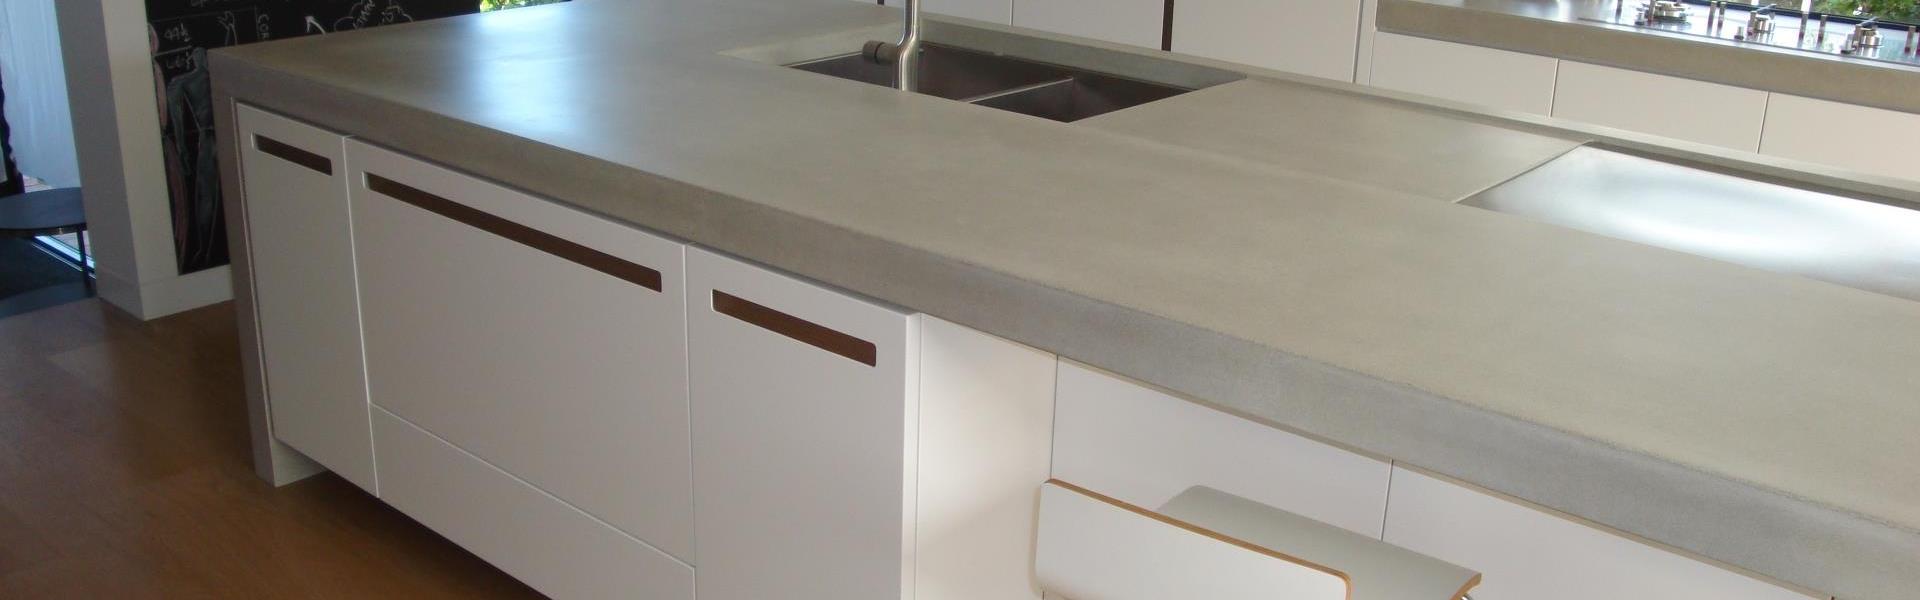 concrete kitchen benchtop 2